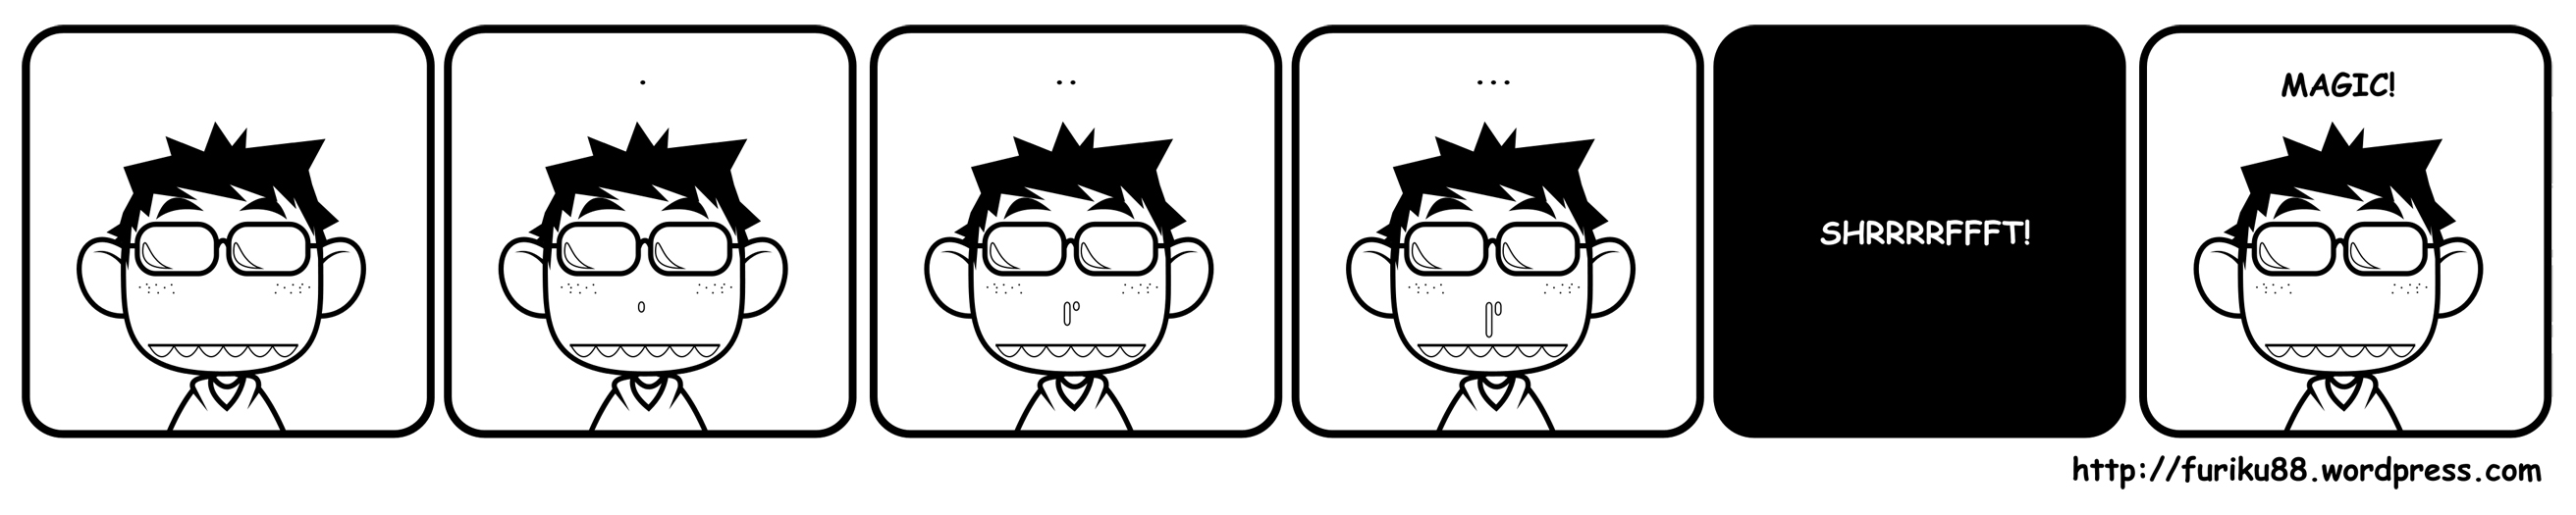 Comic The Premium Side Of Tekuno Furiku Page 3